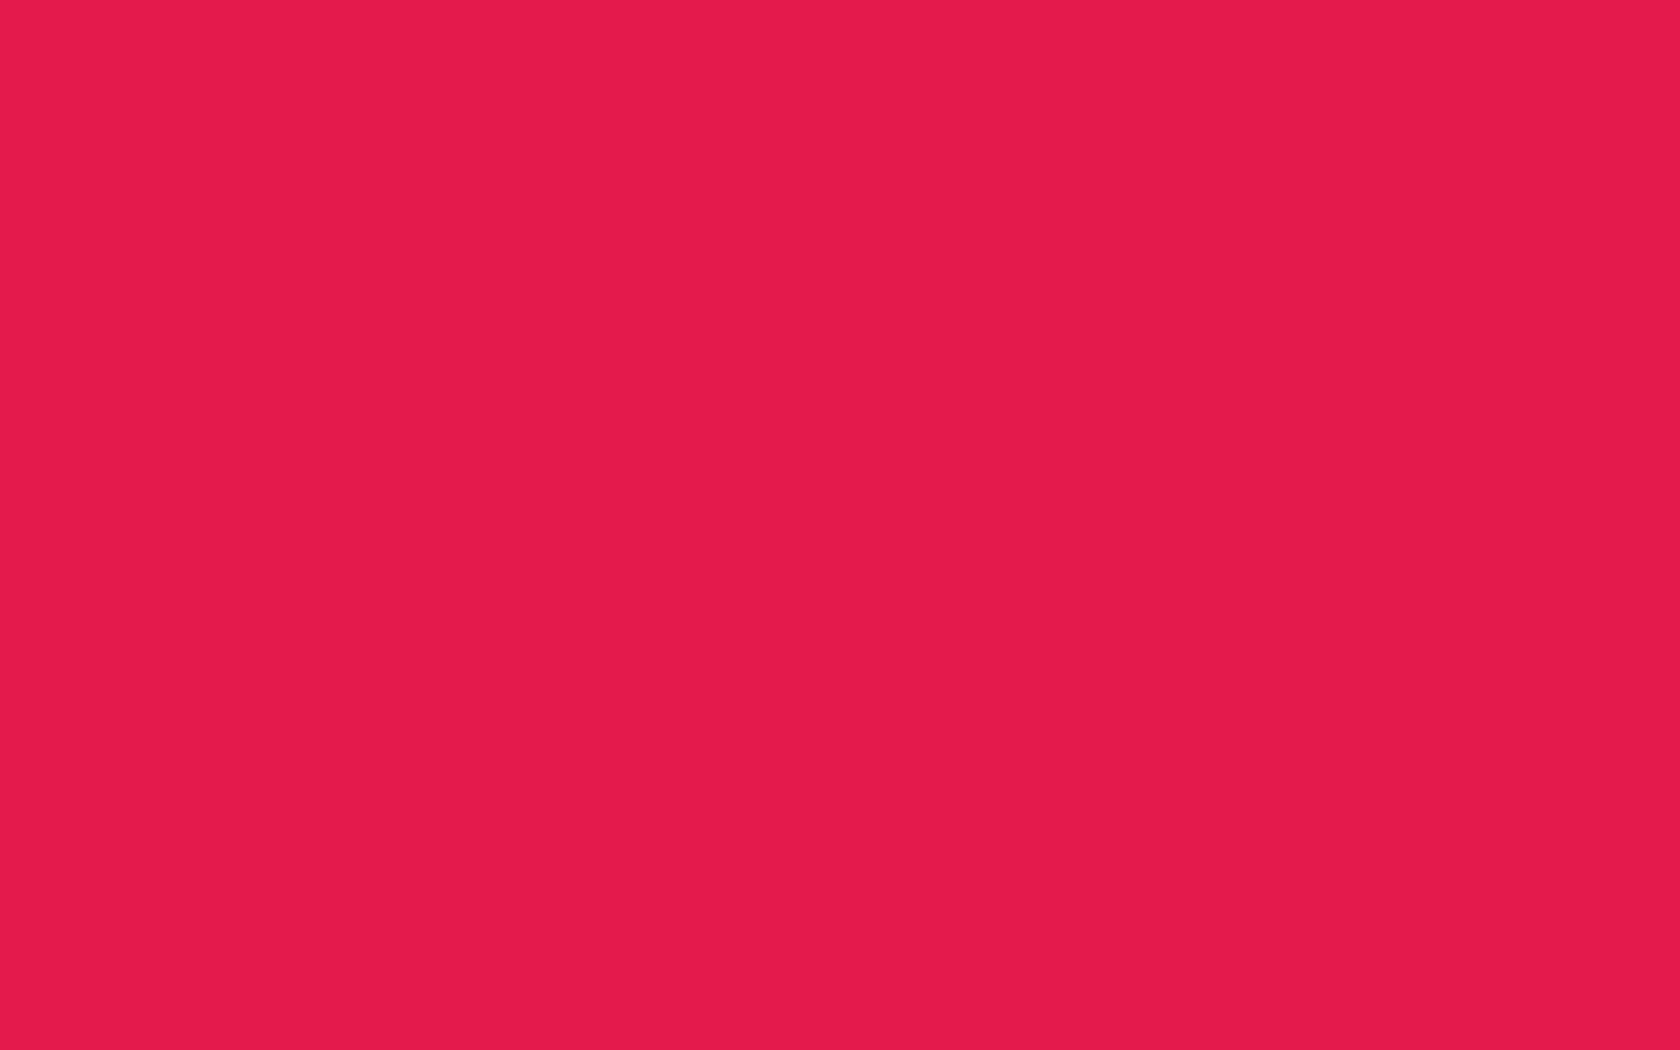 1680x1050 Spanish Crimson Solid Color Background